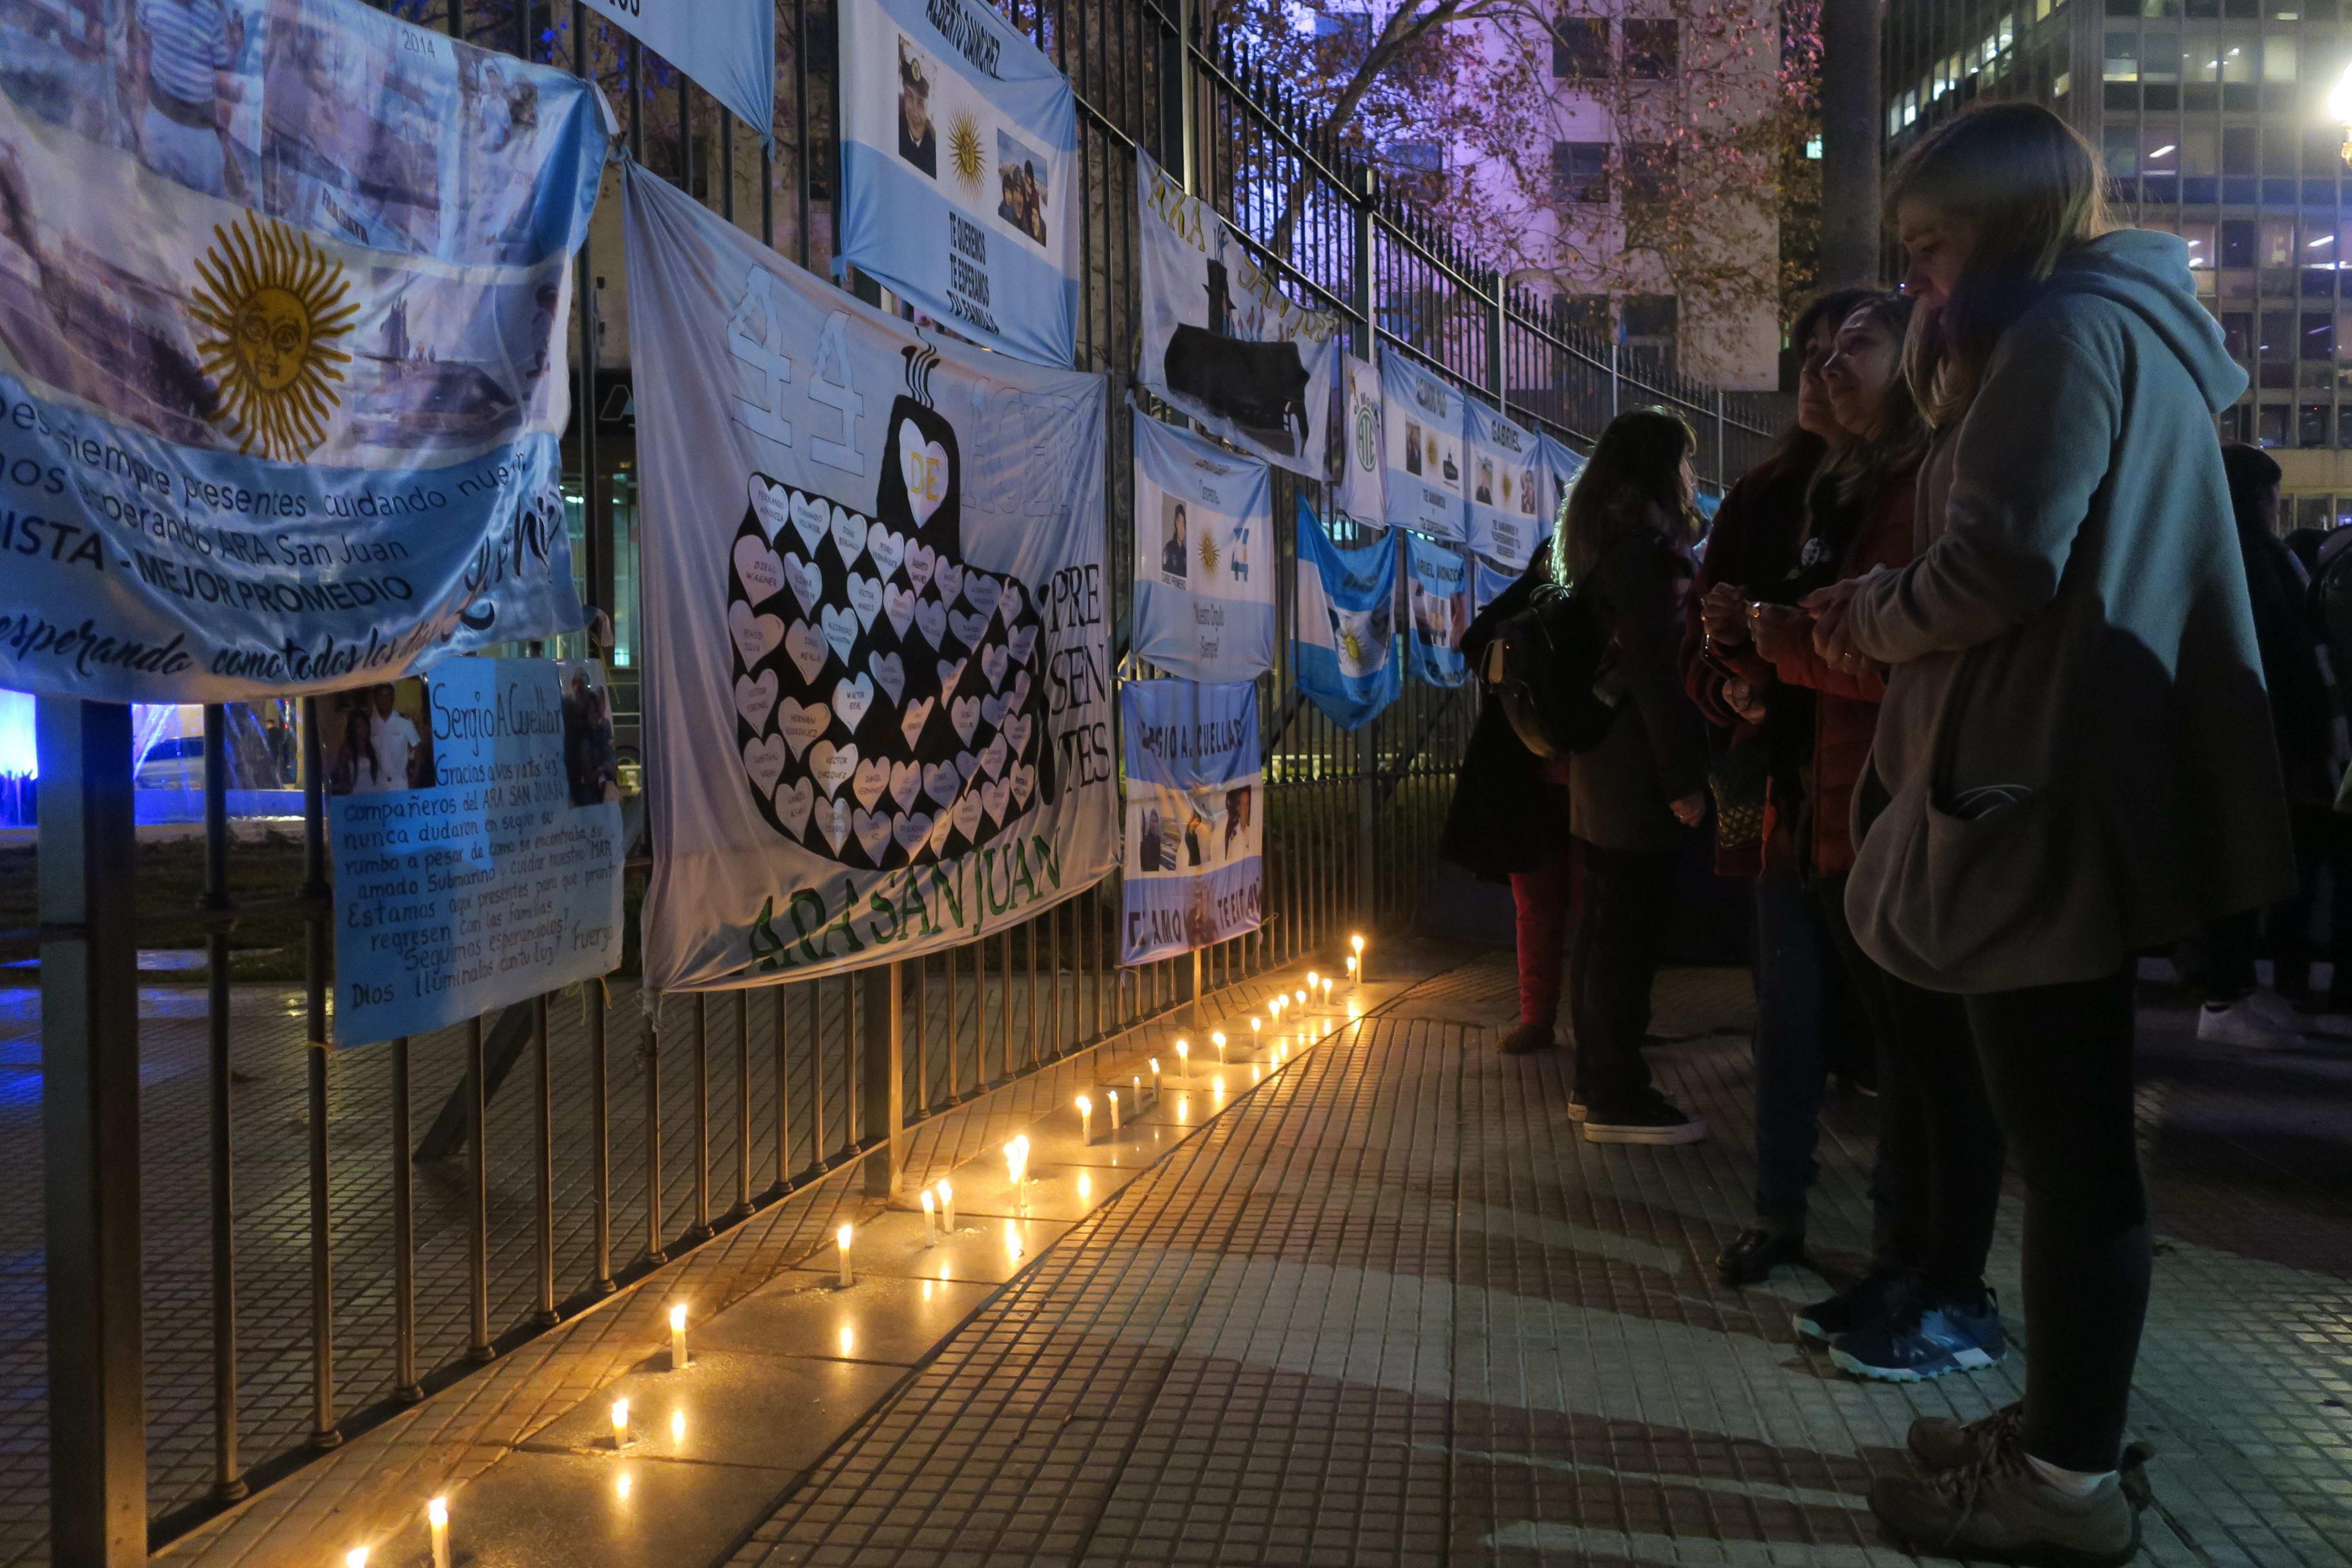 Familias de tripulación de submarino argentino protestan frente a Gobierno